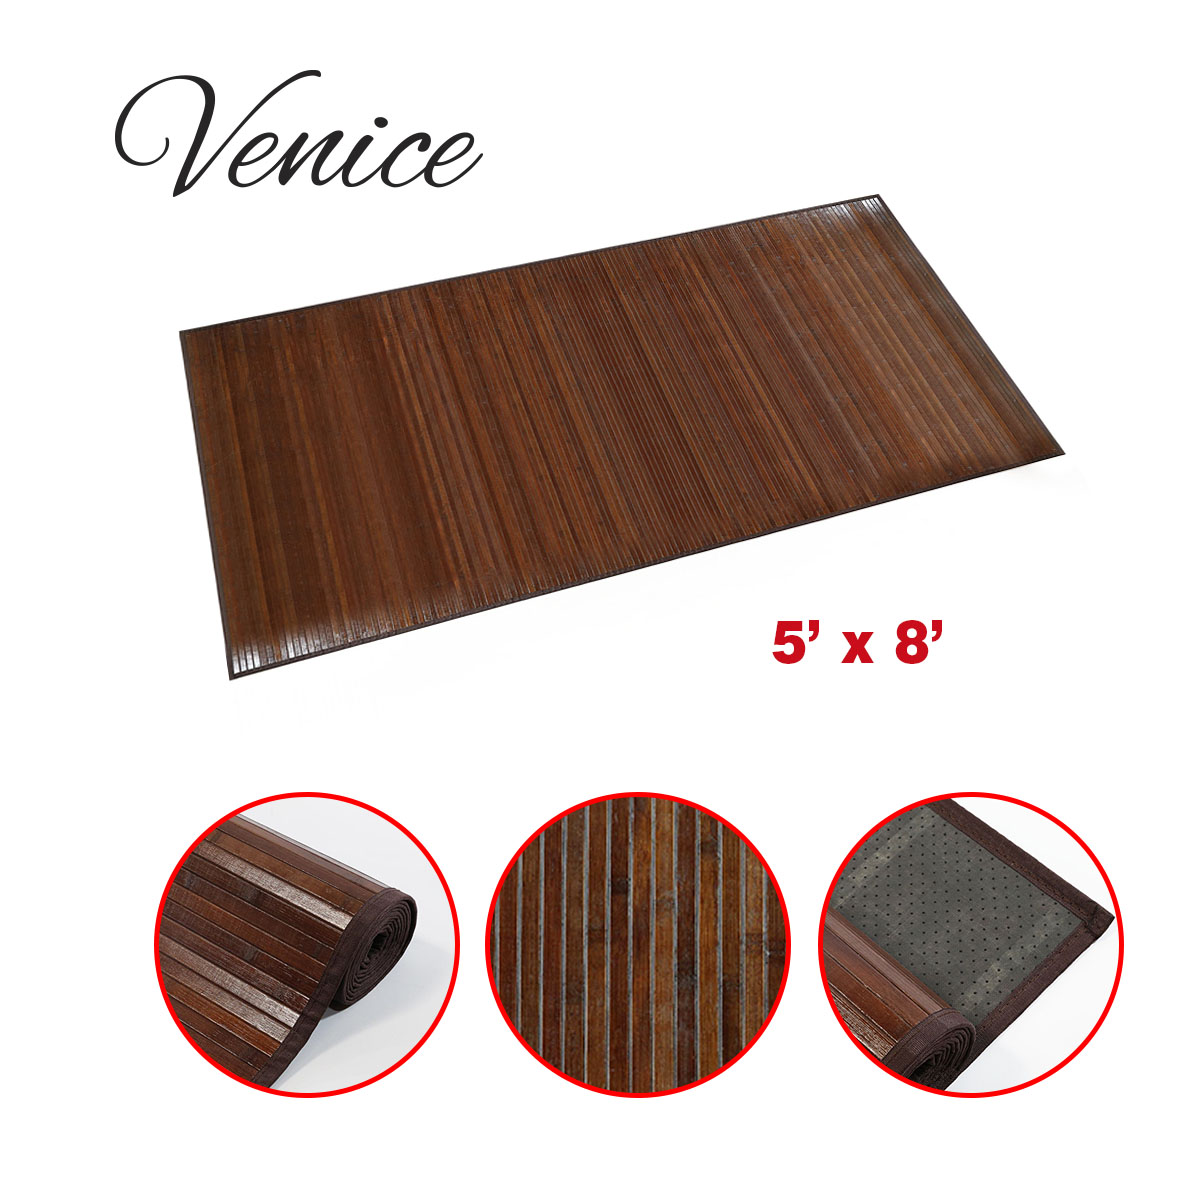 Venice Natural Bamboo 5 X 8 Floor Mat Walnut Color Area Rug